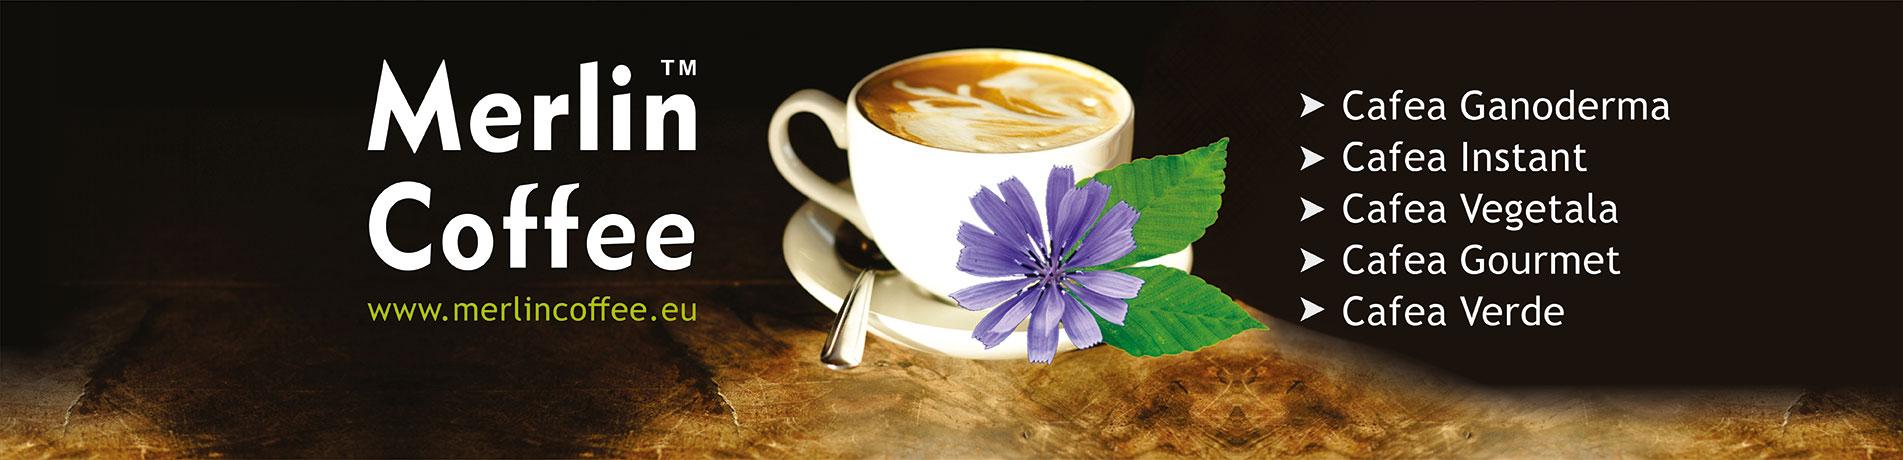 banner-merlin-coffee-3